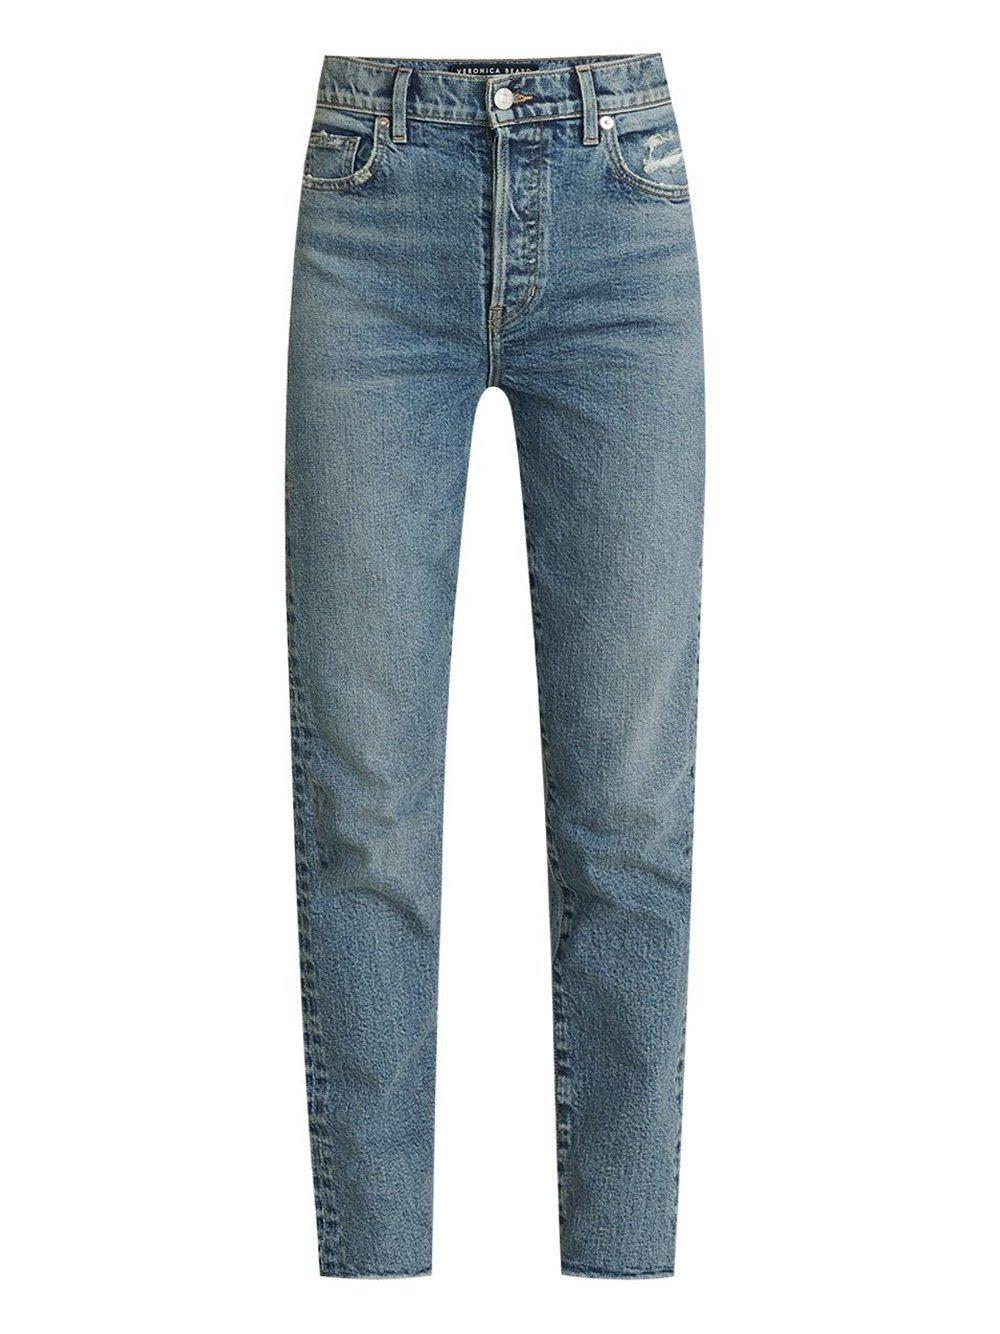 Ryleigh Straight Leg Jean Item # J20091700642NB